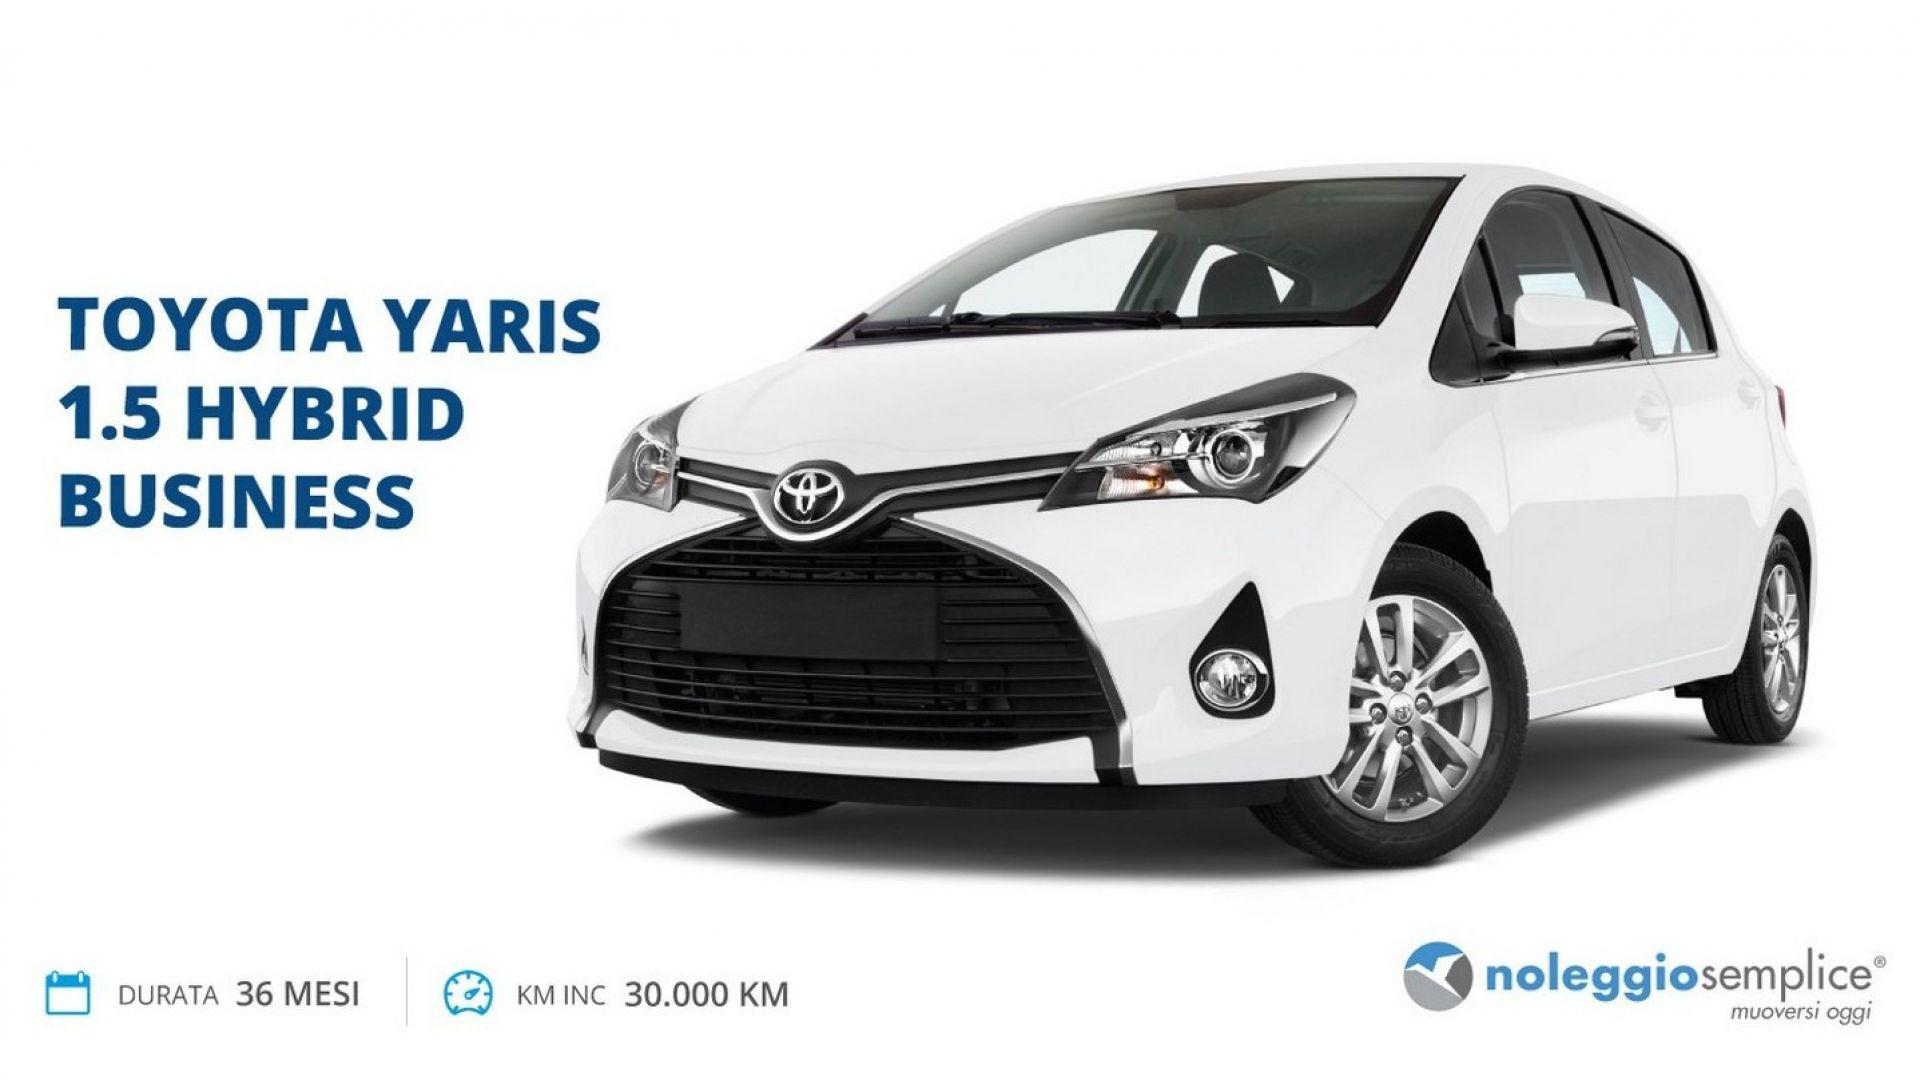 Toyota Yaris ibrida noleggio prezzo